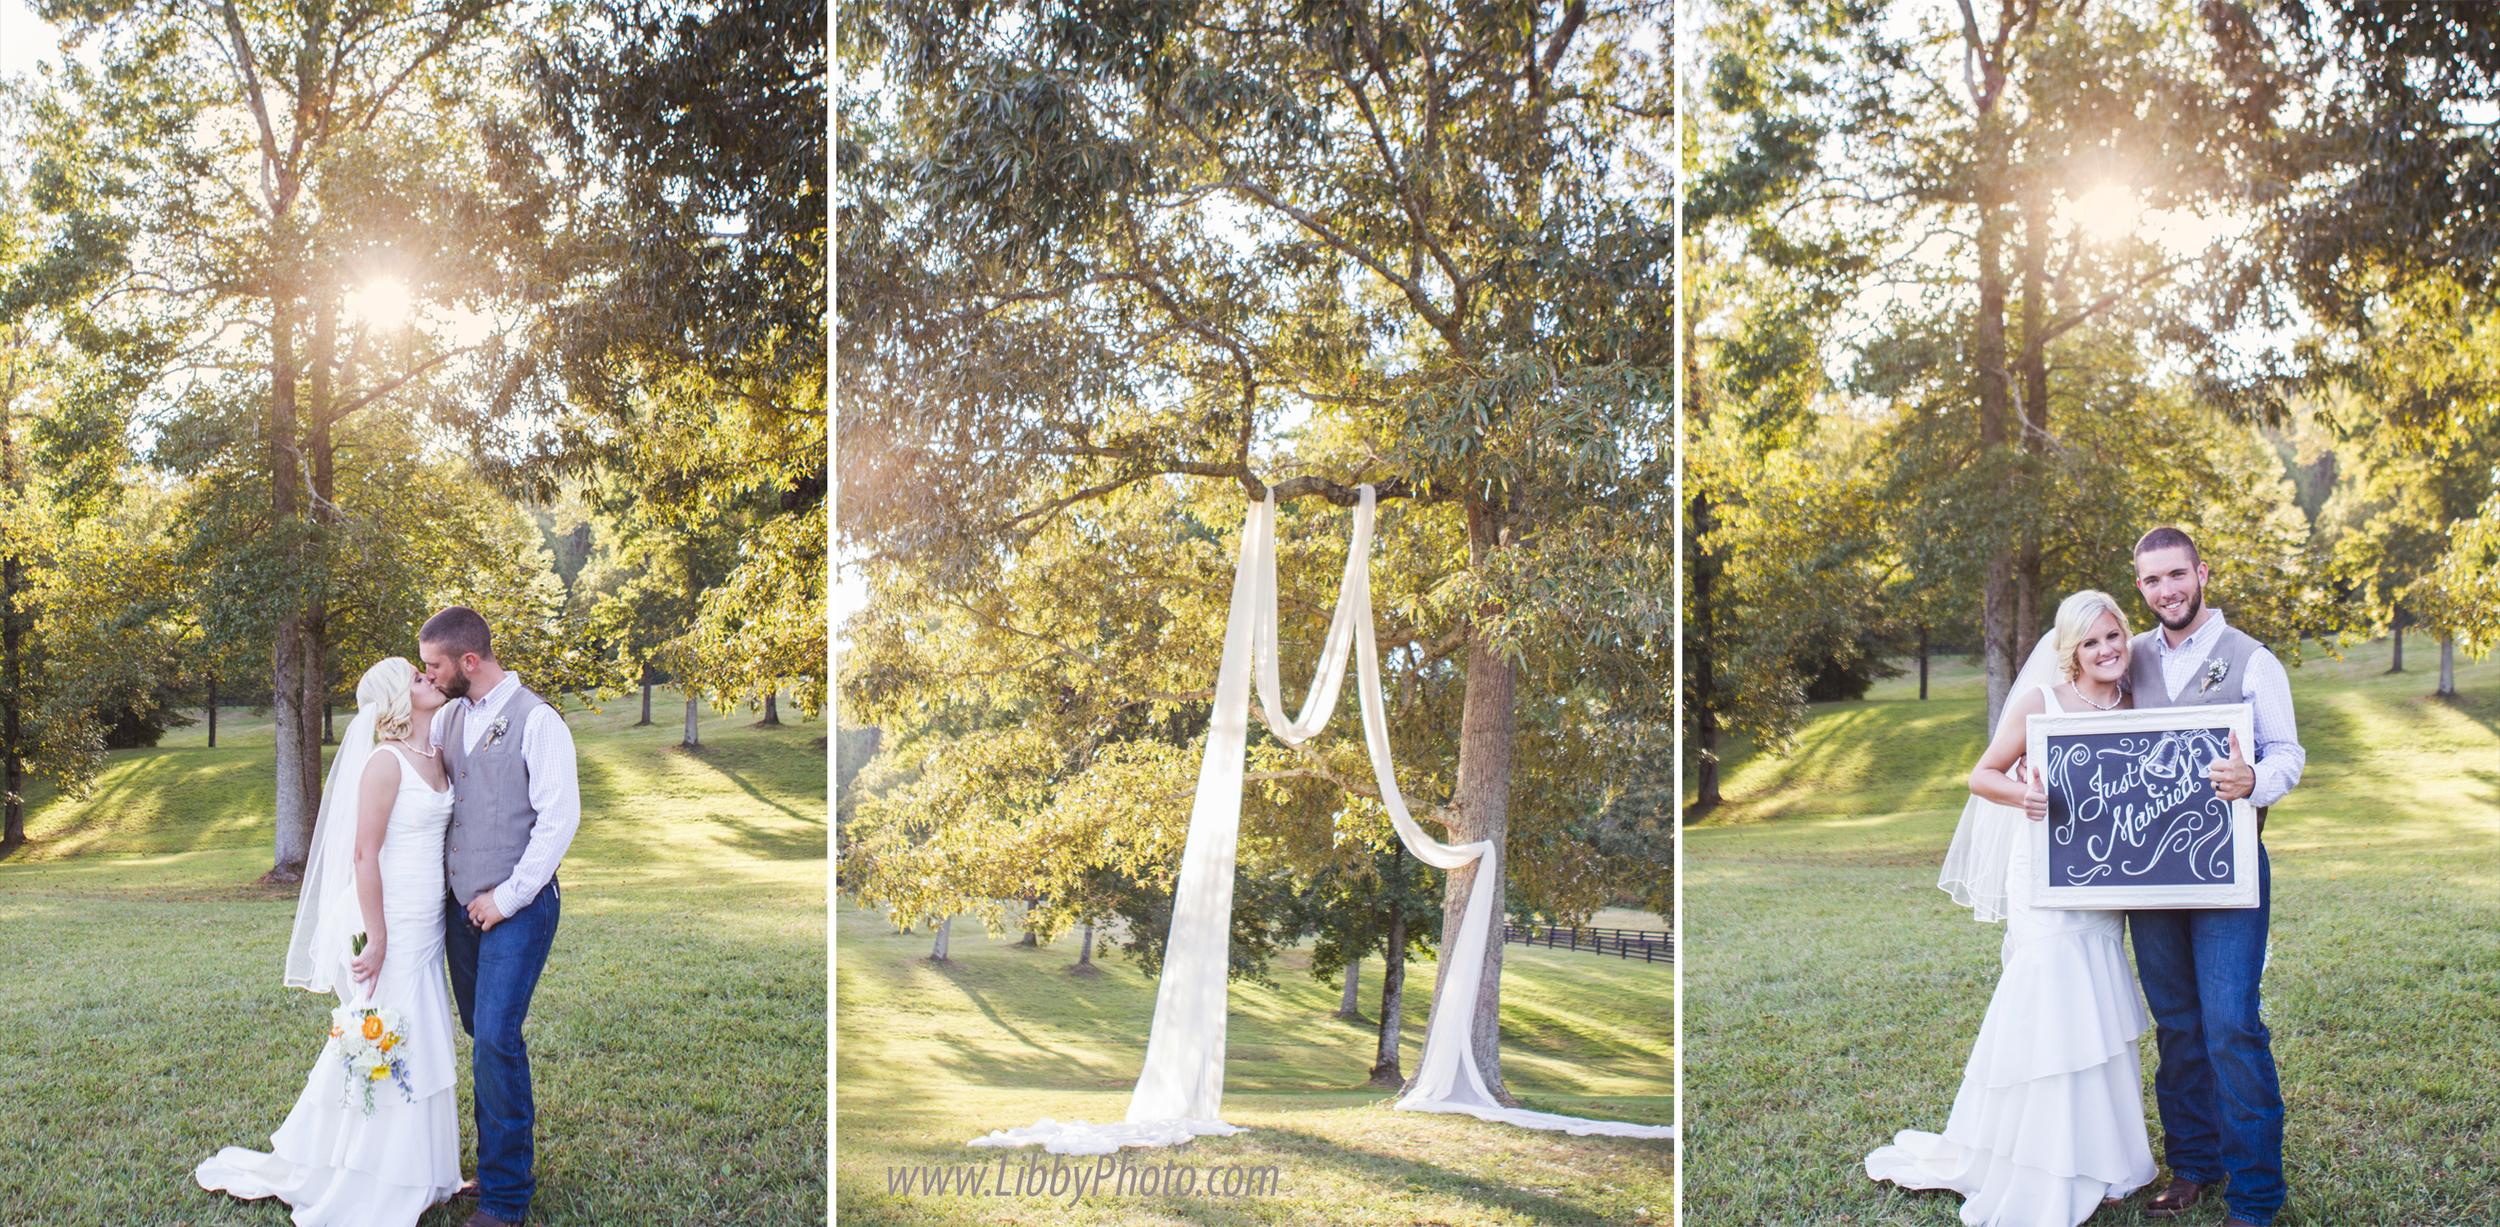 Atlatna wedding photography Libbyphoto (49).jpg